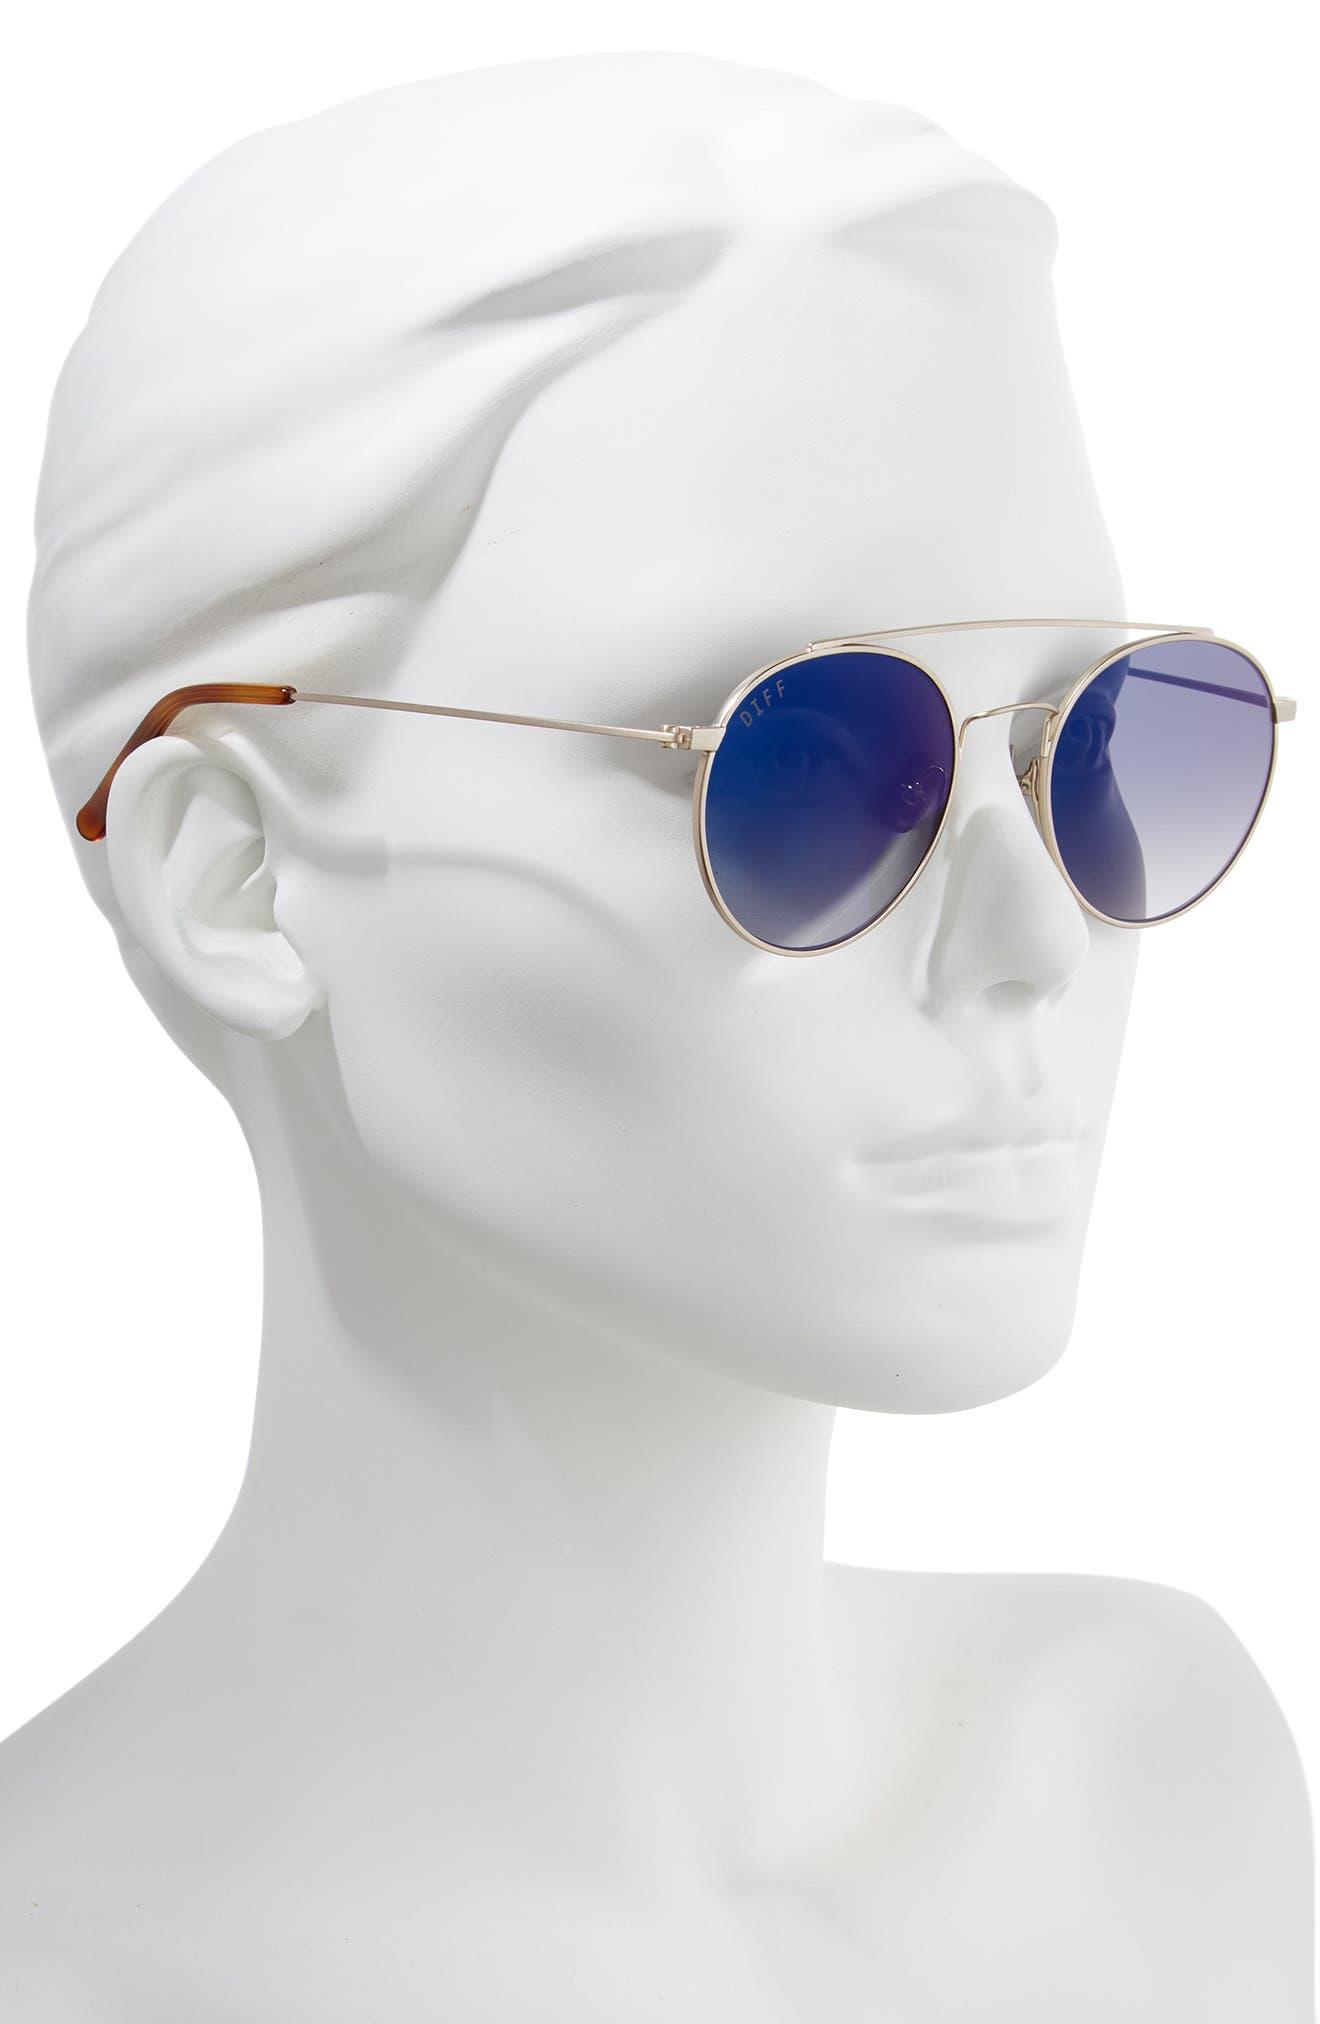 Skye 51mm Aviator Sunglasses,                             Alternate thumbnail 2, color,                             BRUSHED GOLD/ BLUE